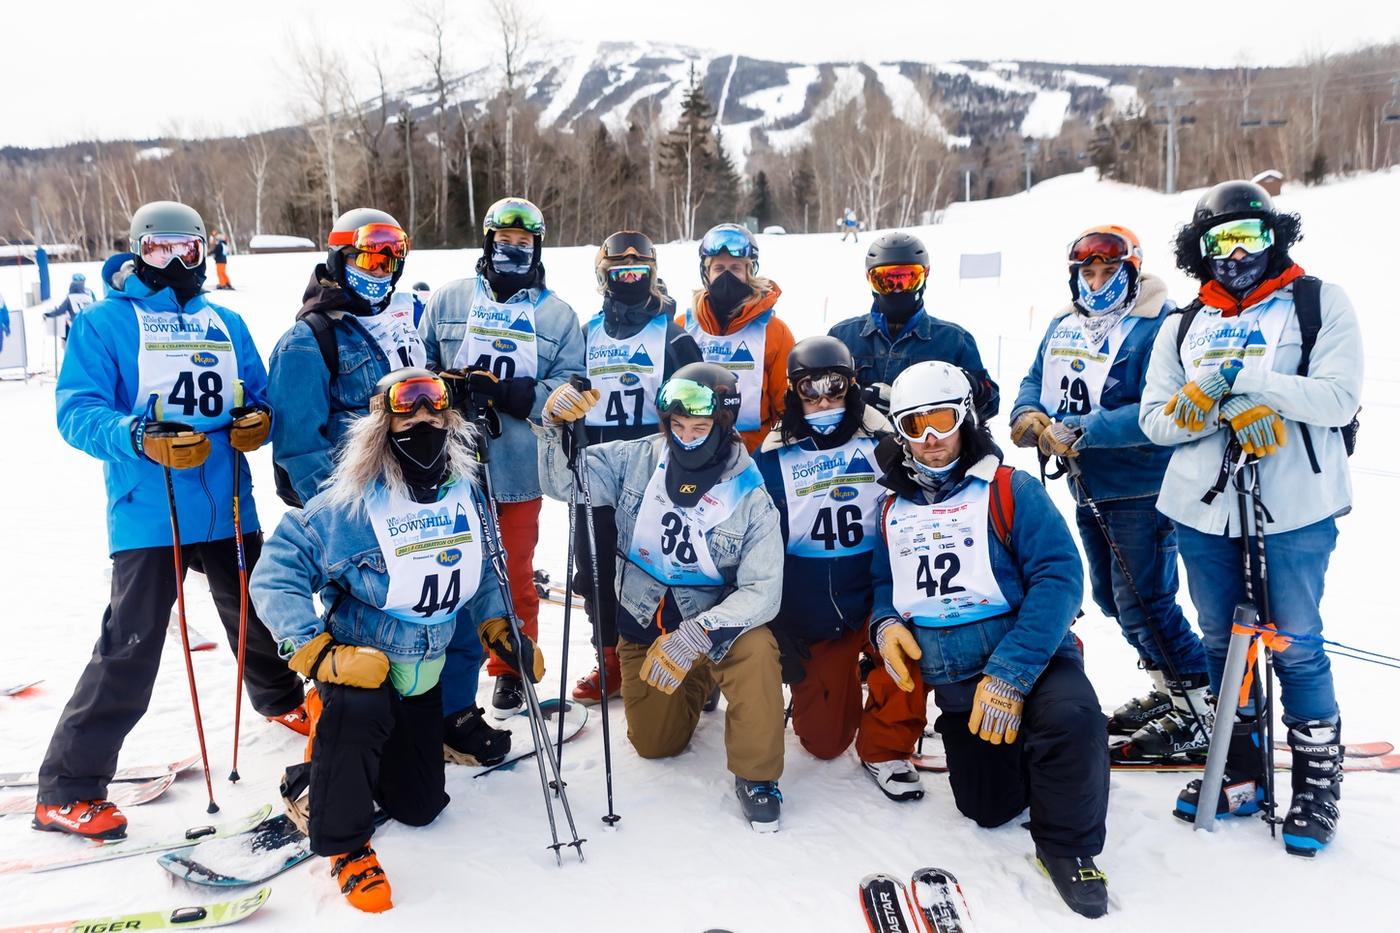 WinterKids Downhill 24 2021 SDP 2977